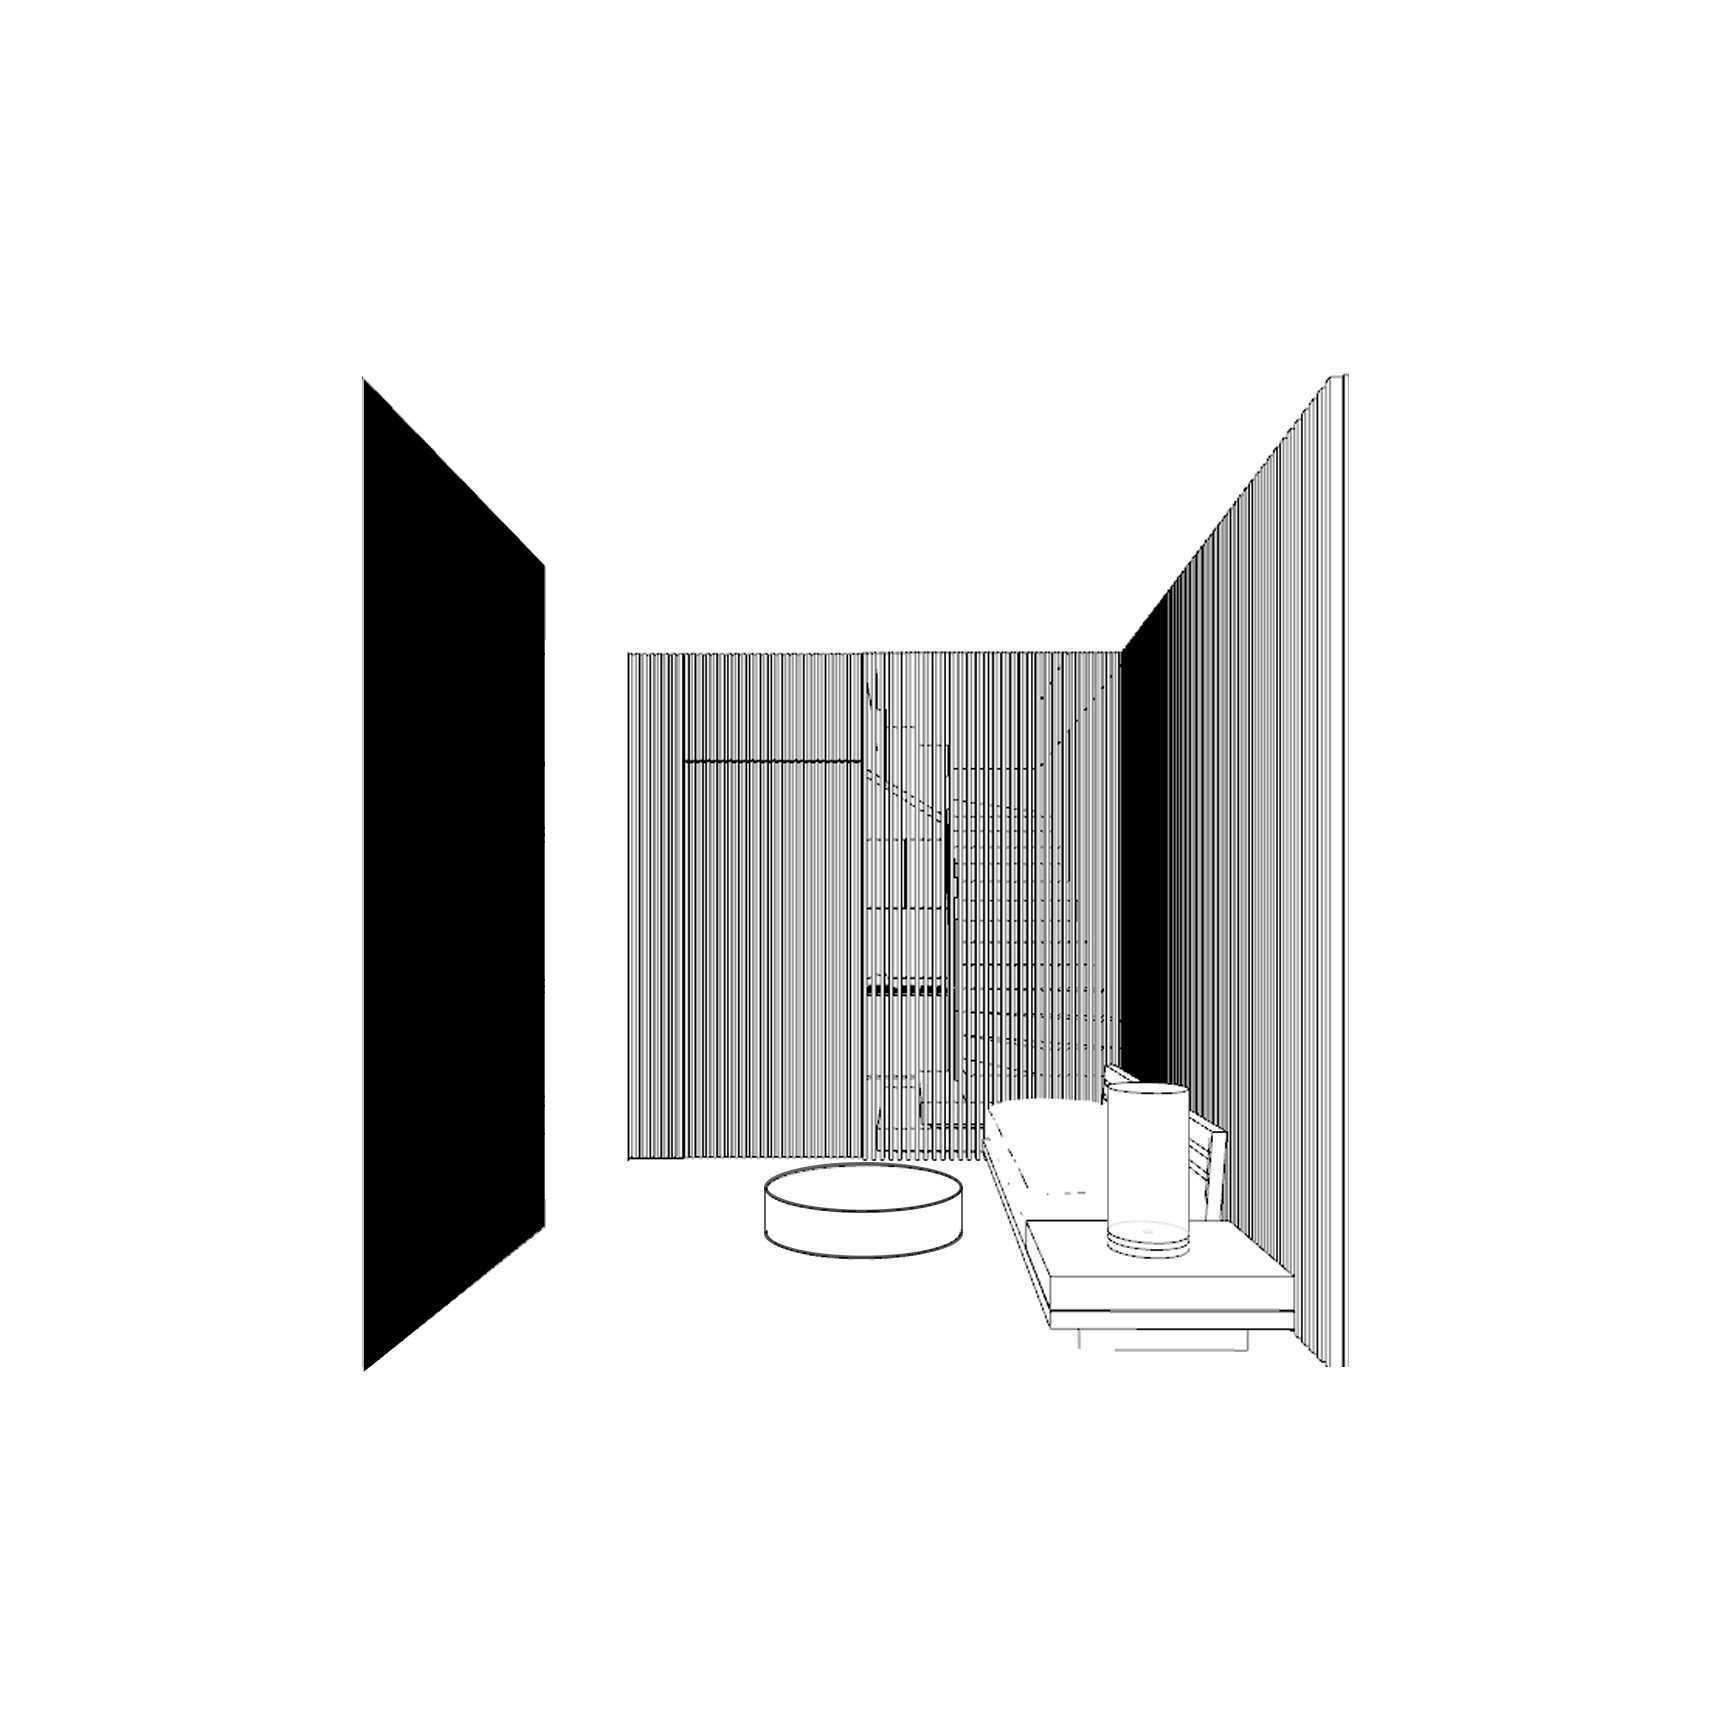 Mitrasasana - Design & Build Yg House Bekasi, Kota Bks, Jawa Barat, Indonesia Bekasi, Kota Bks, Jawa Barat, Indonesia Mitrasasana-Design-Build-Yg-House  78696